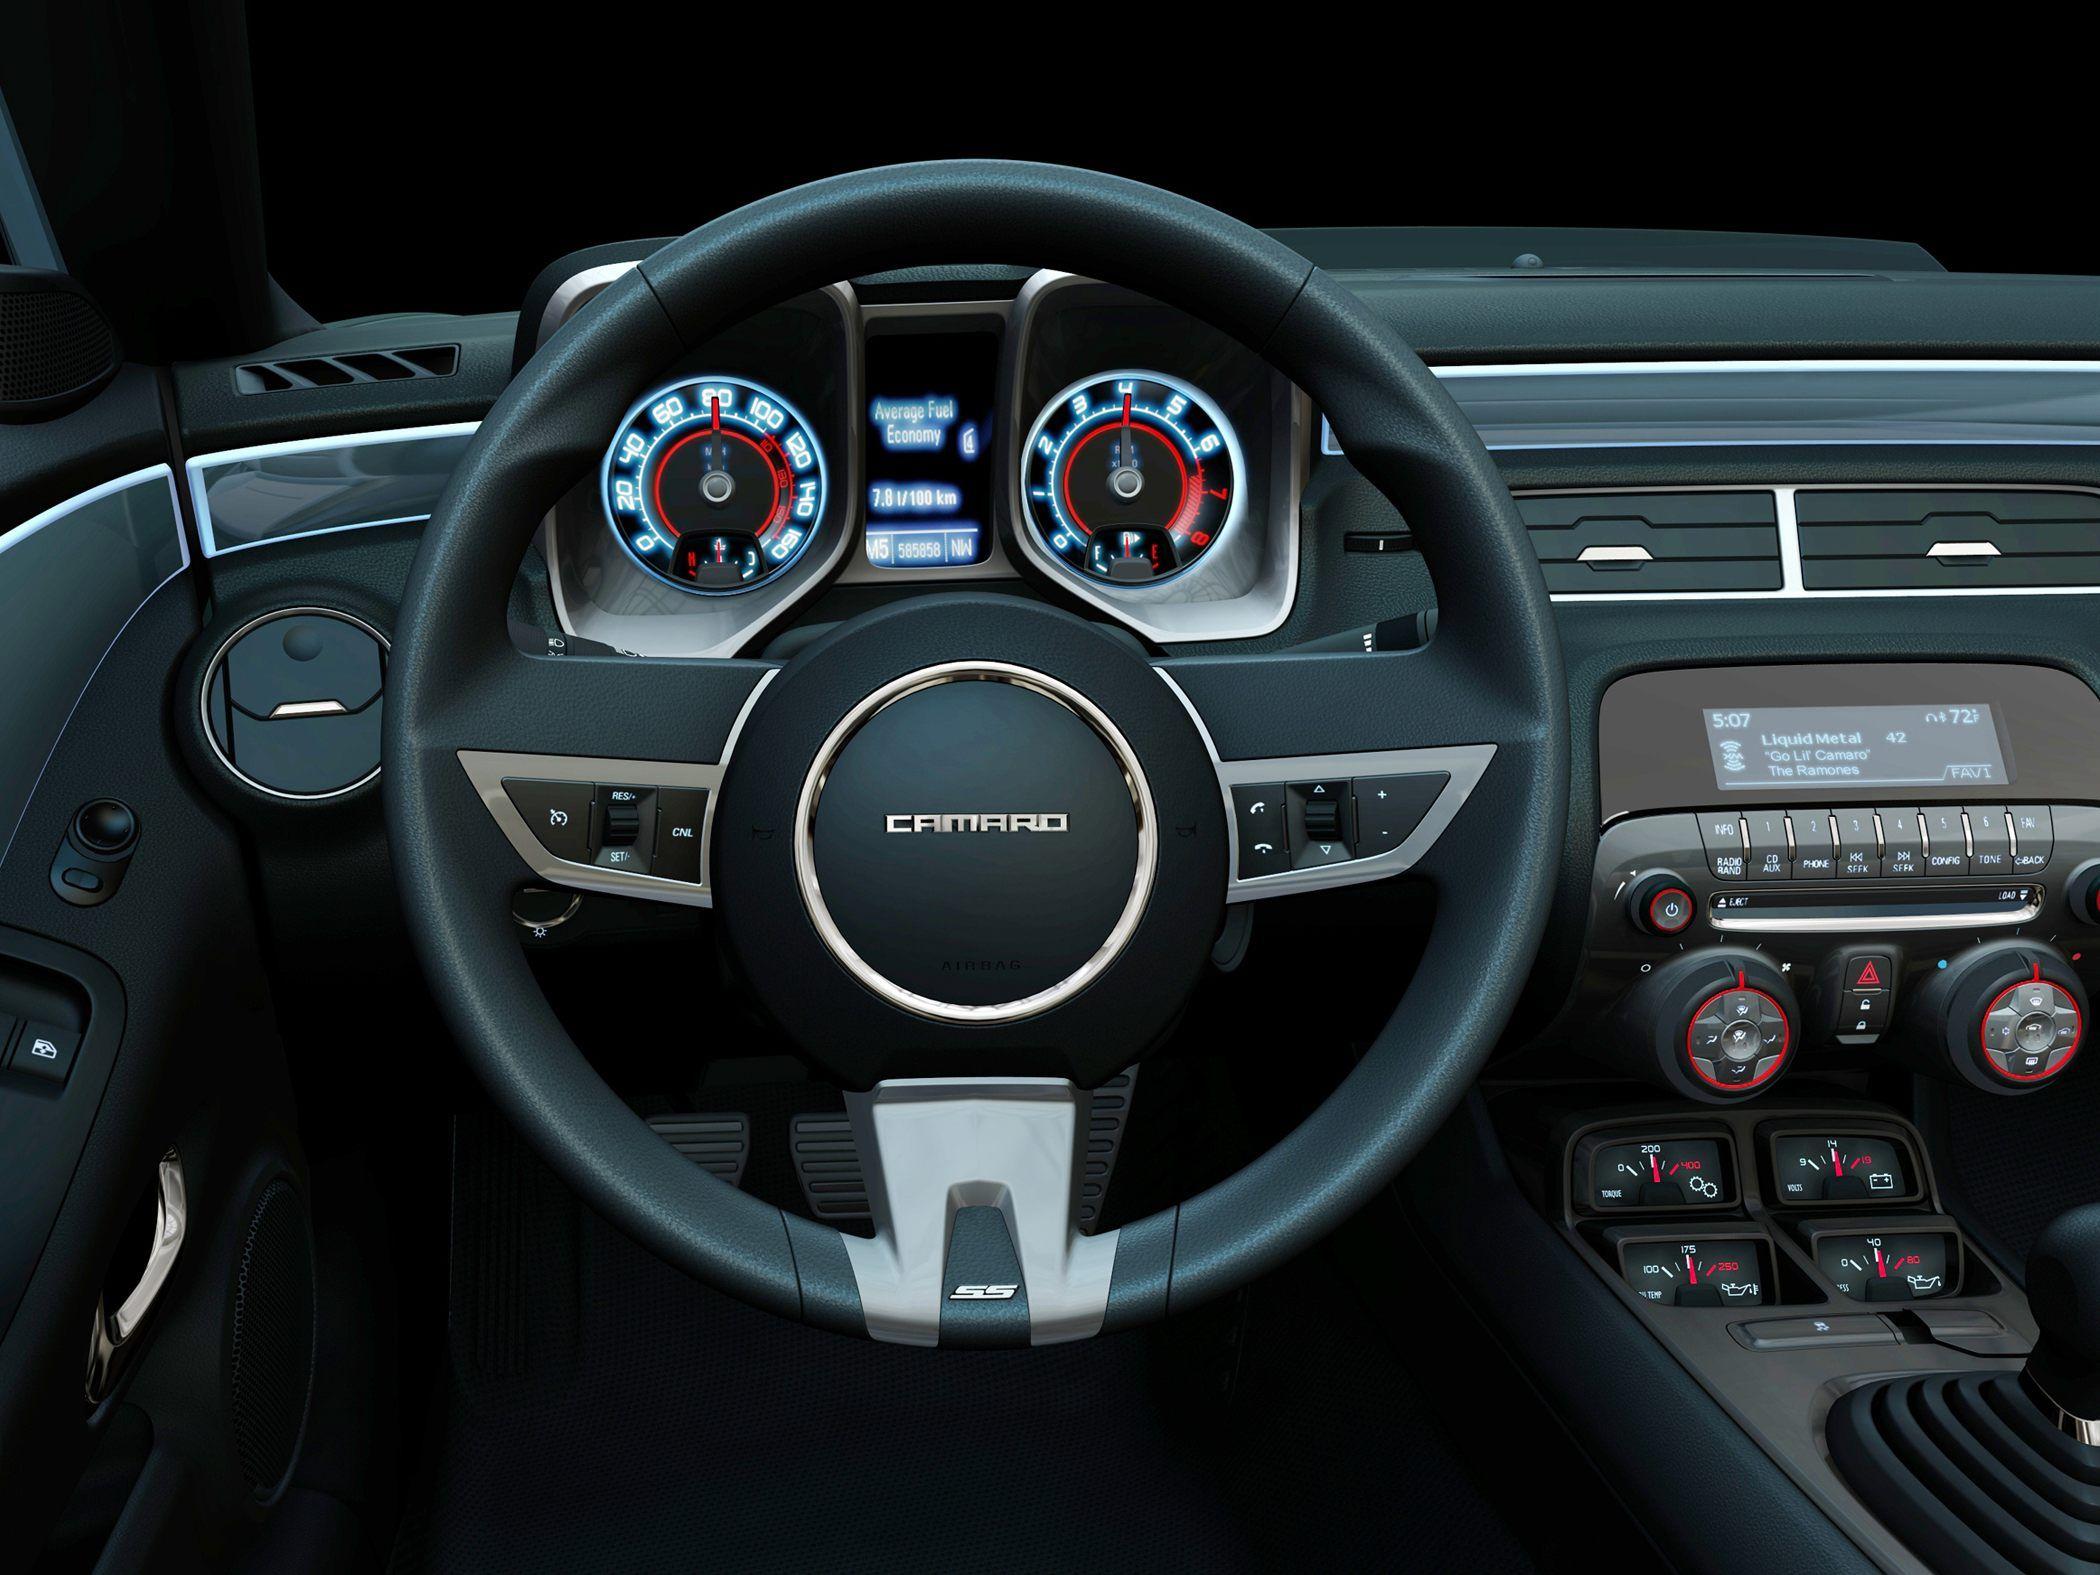 Chevy Camaro Interior JGVhShLm